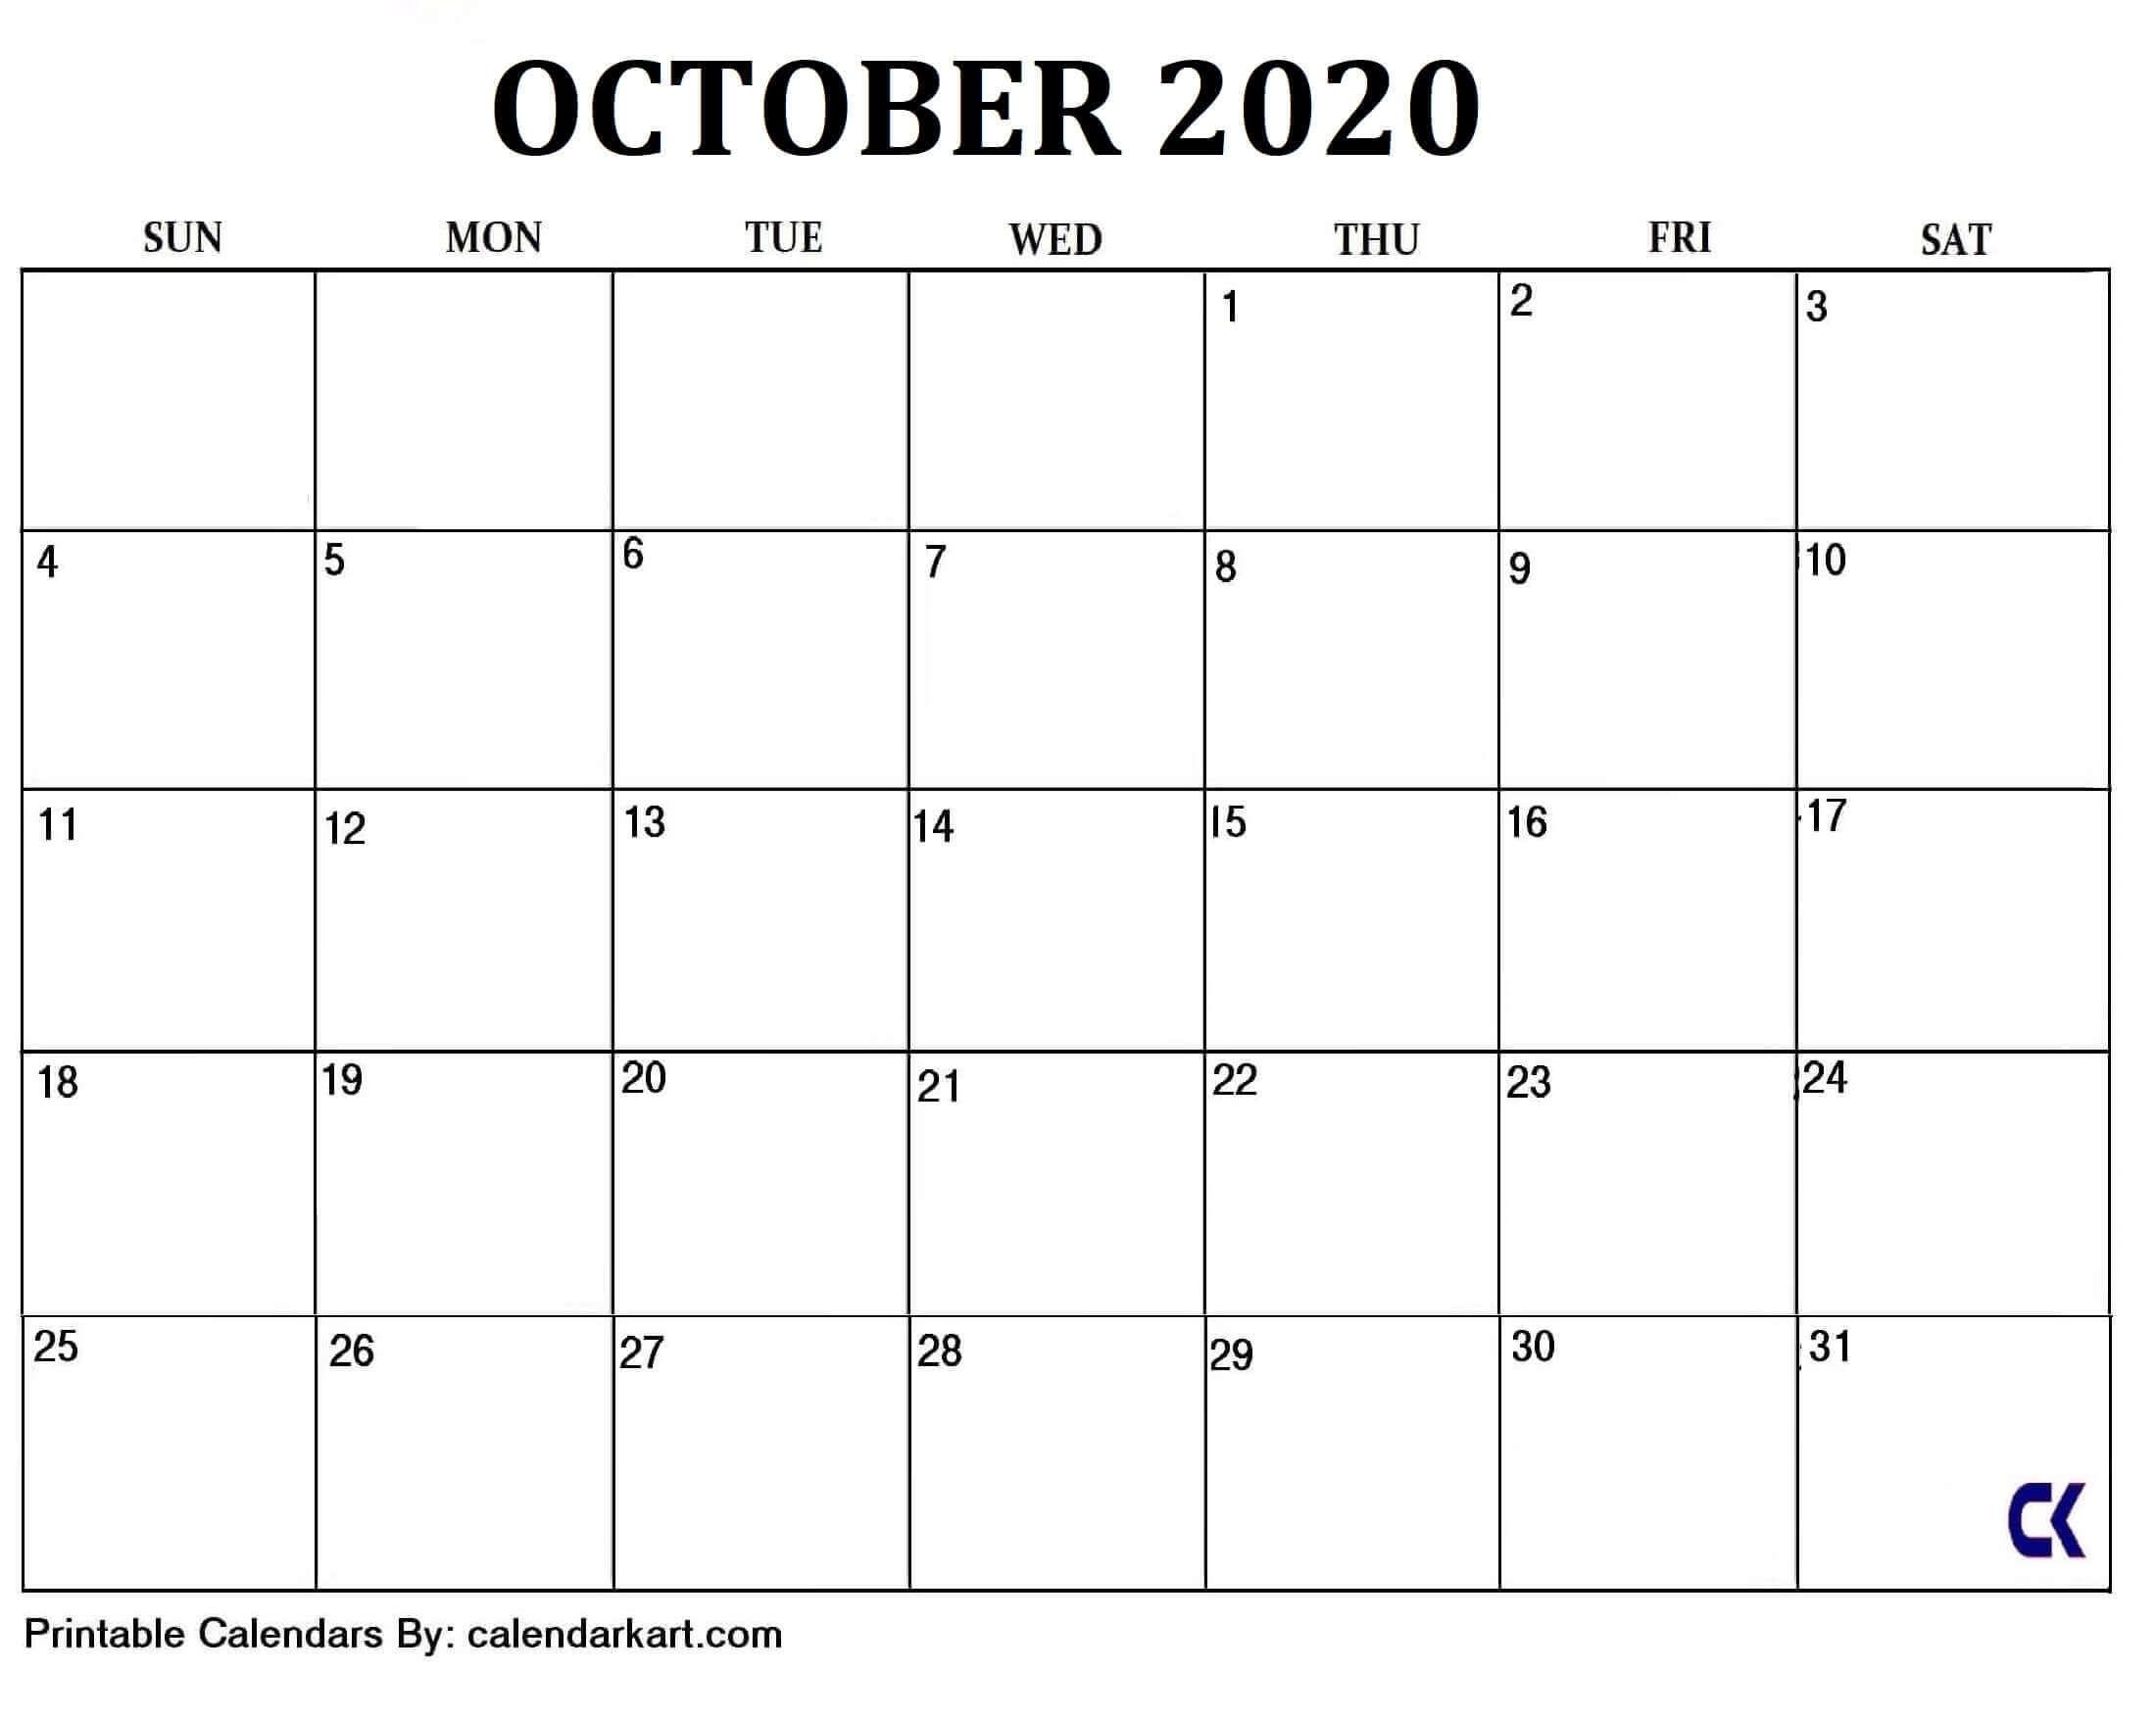 6 Cute And Elegant Free Printable October 2020 Calendar Free Calendar Grid Template